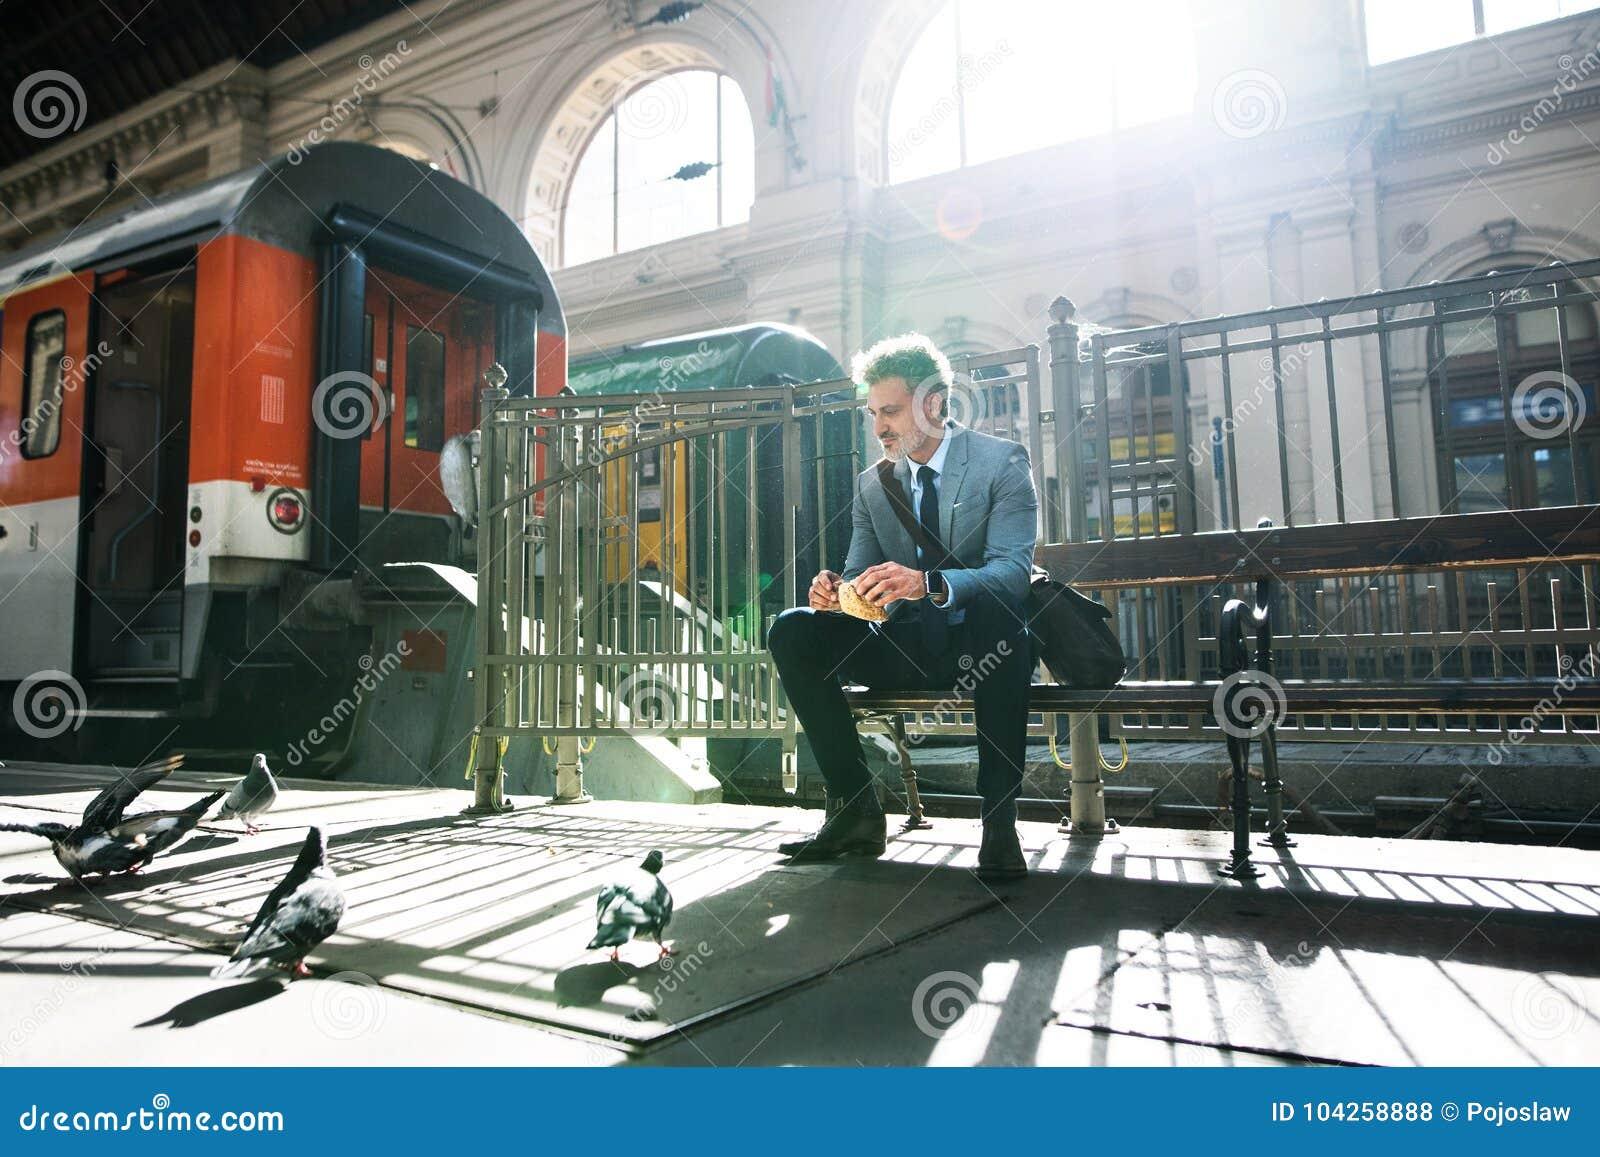 Download 在火车站的成熟商人 库存照片. 图片 包括有 鸽子, 电话会议, 头发, 城市, 发芽的, 诱饵, 灰色 - 104258888